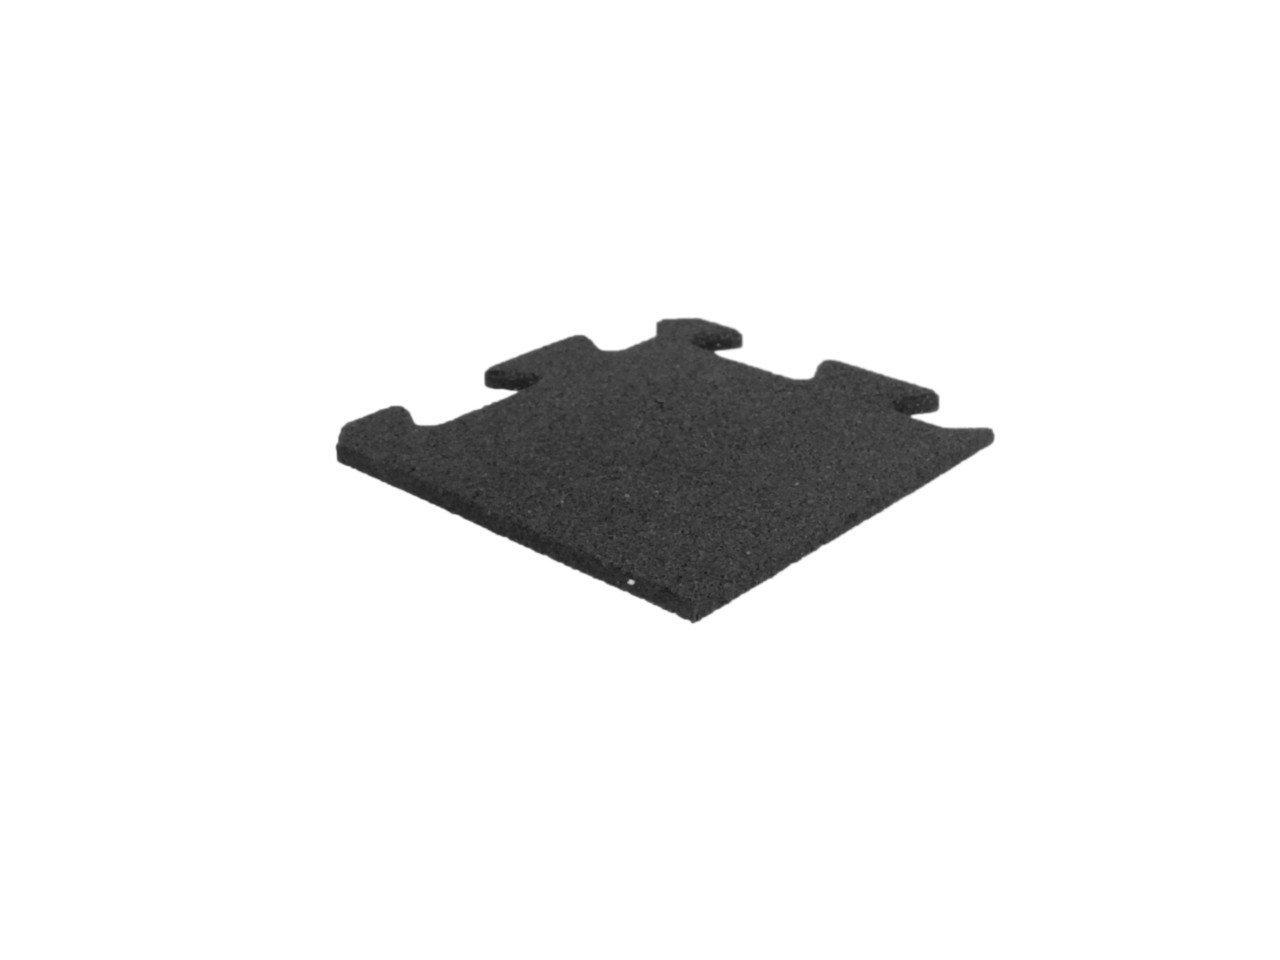 Lifemaxx ECO Puzzle Gummiflise Hjørne 25 x 25 x 1 cm